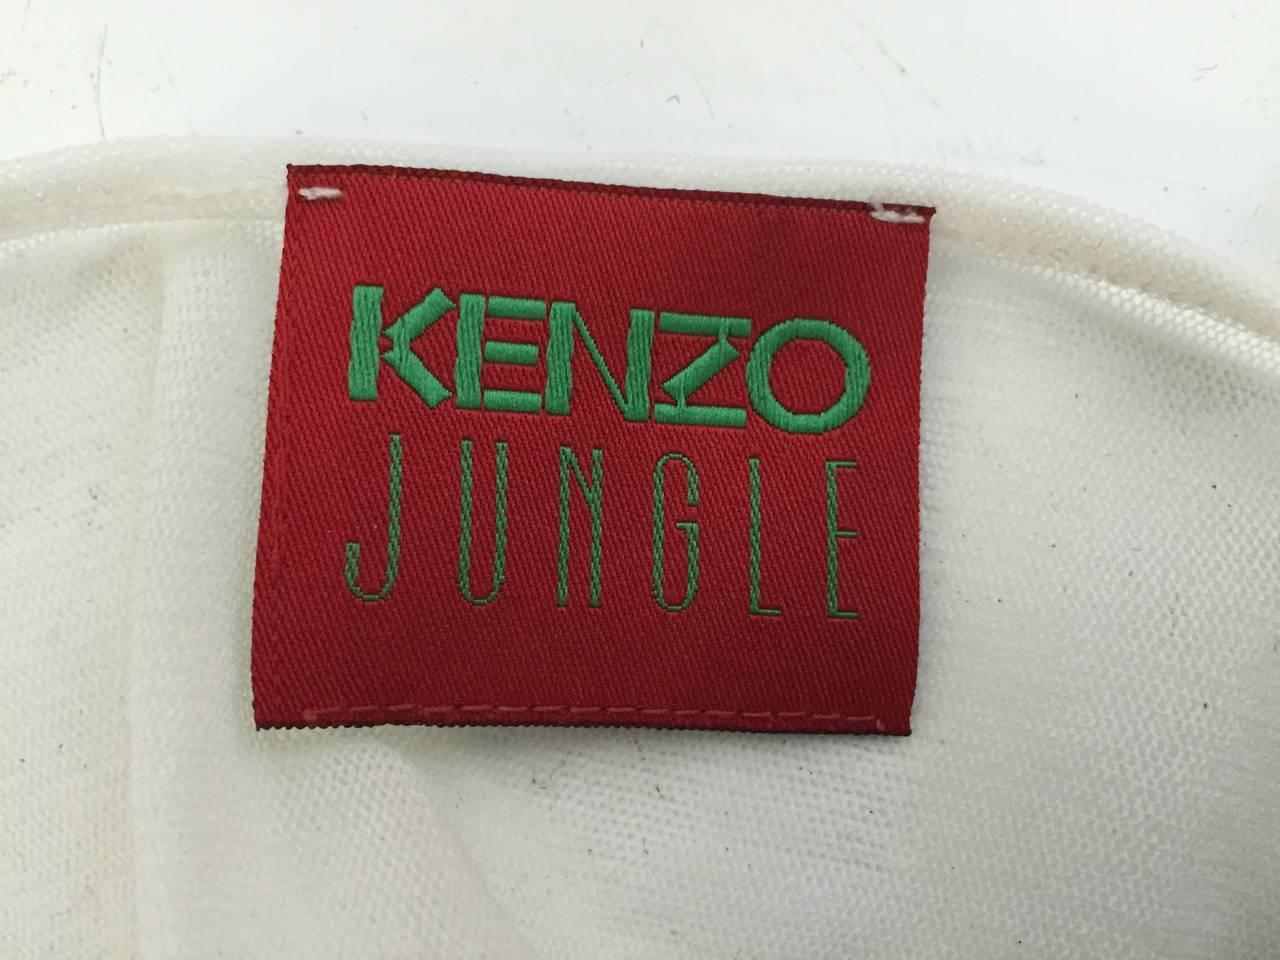 Kenzo Jungle Asian sheer long sleeve top size small. 10